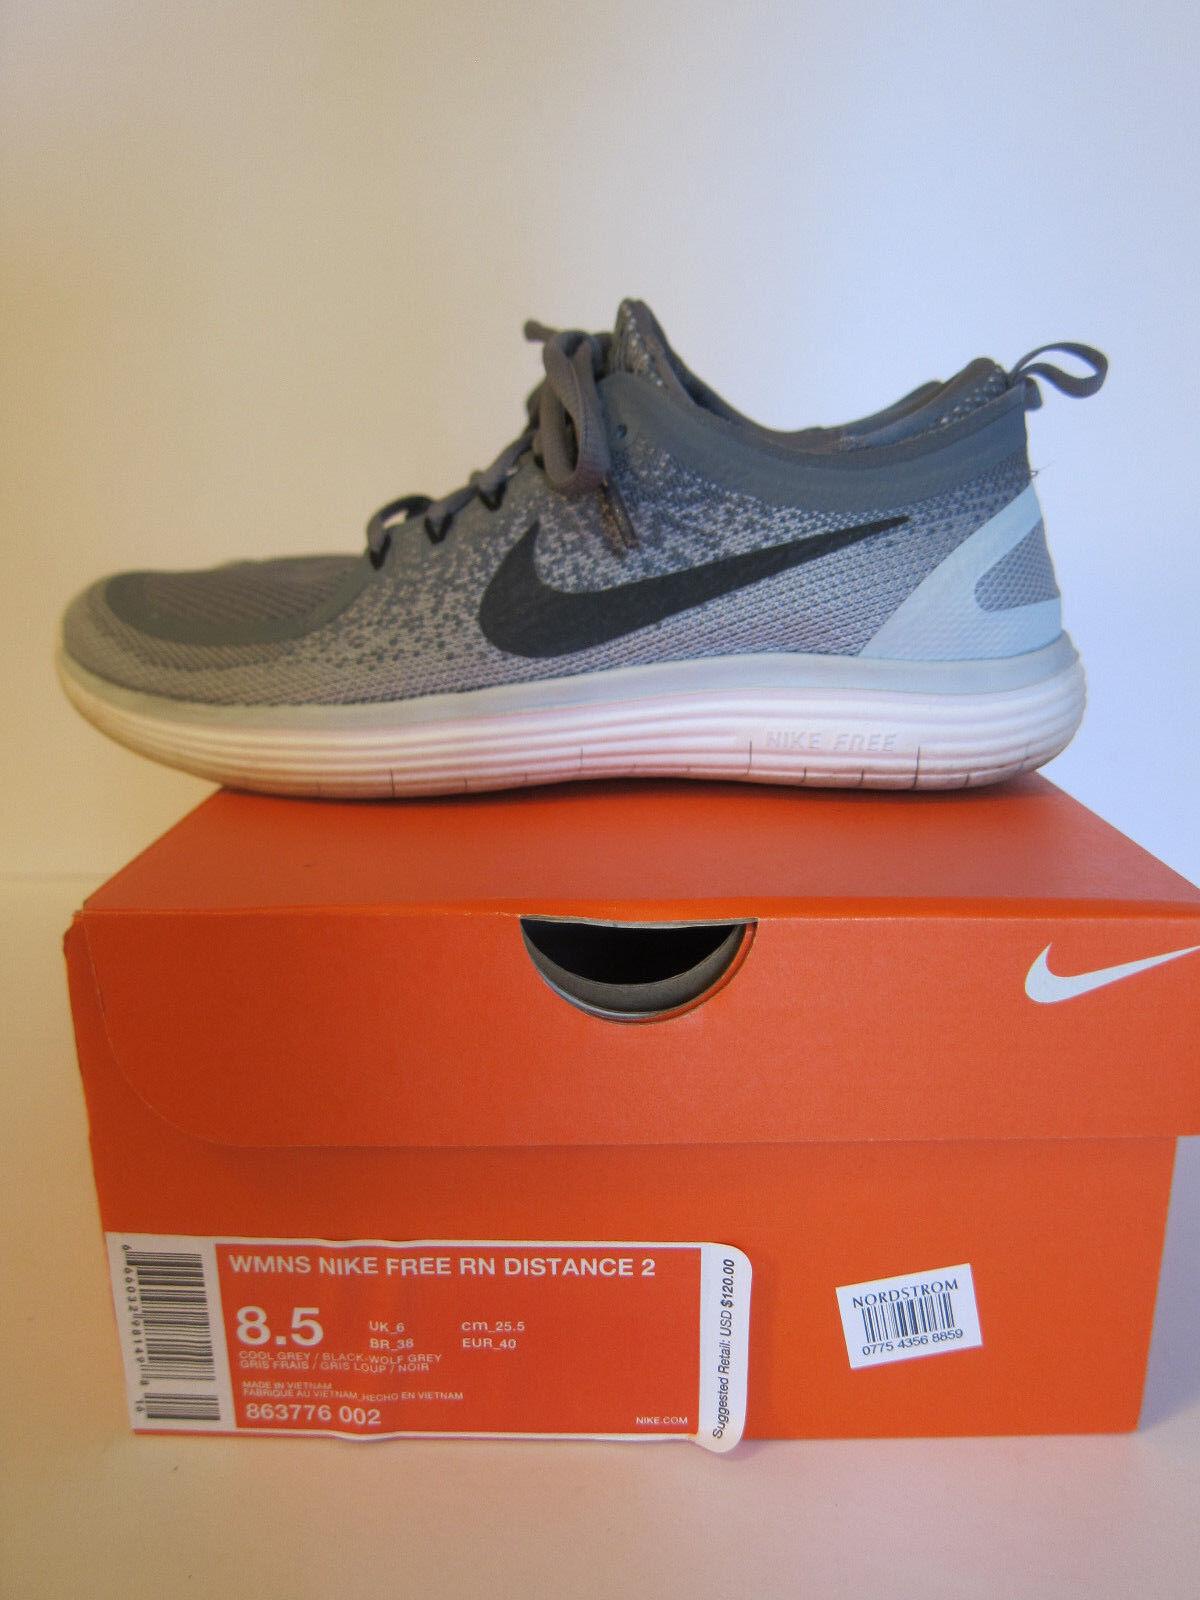 WMNS Nike Free RN Distance 2 - Size 8.5 - Cool Grey - 863776 002